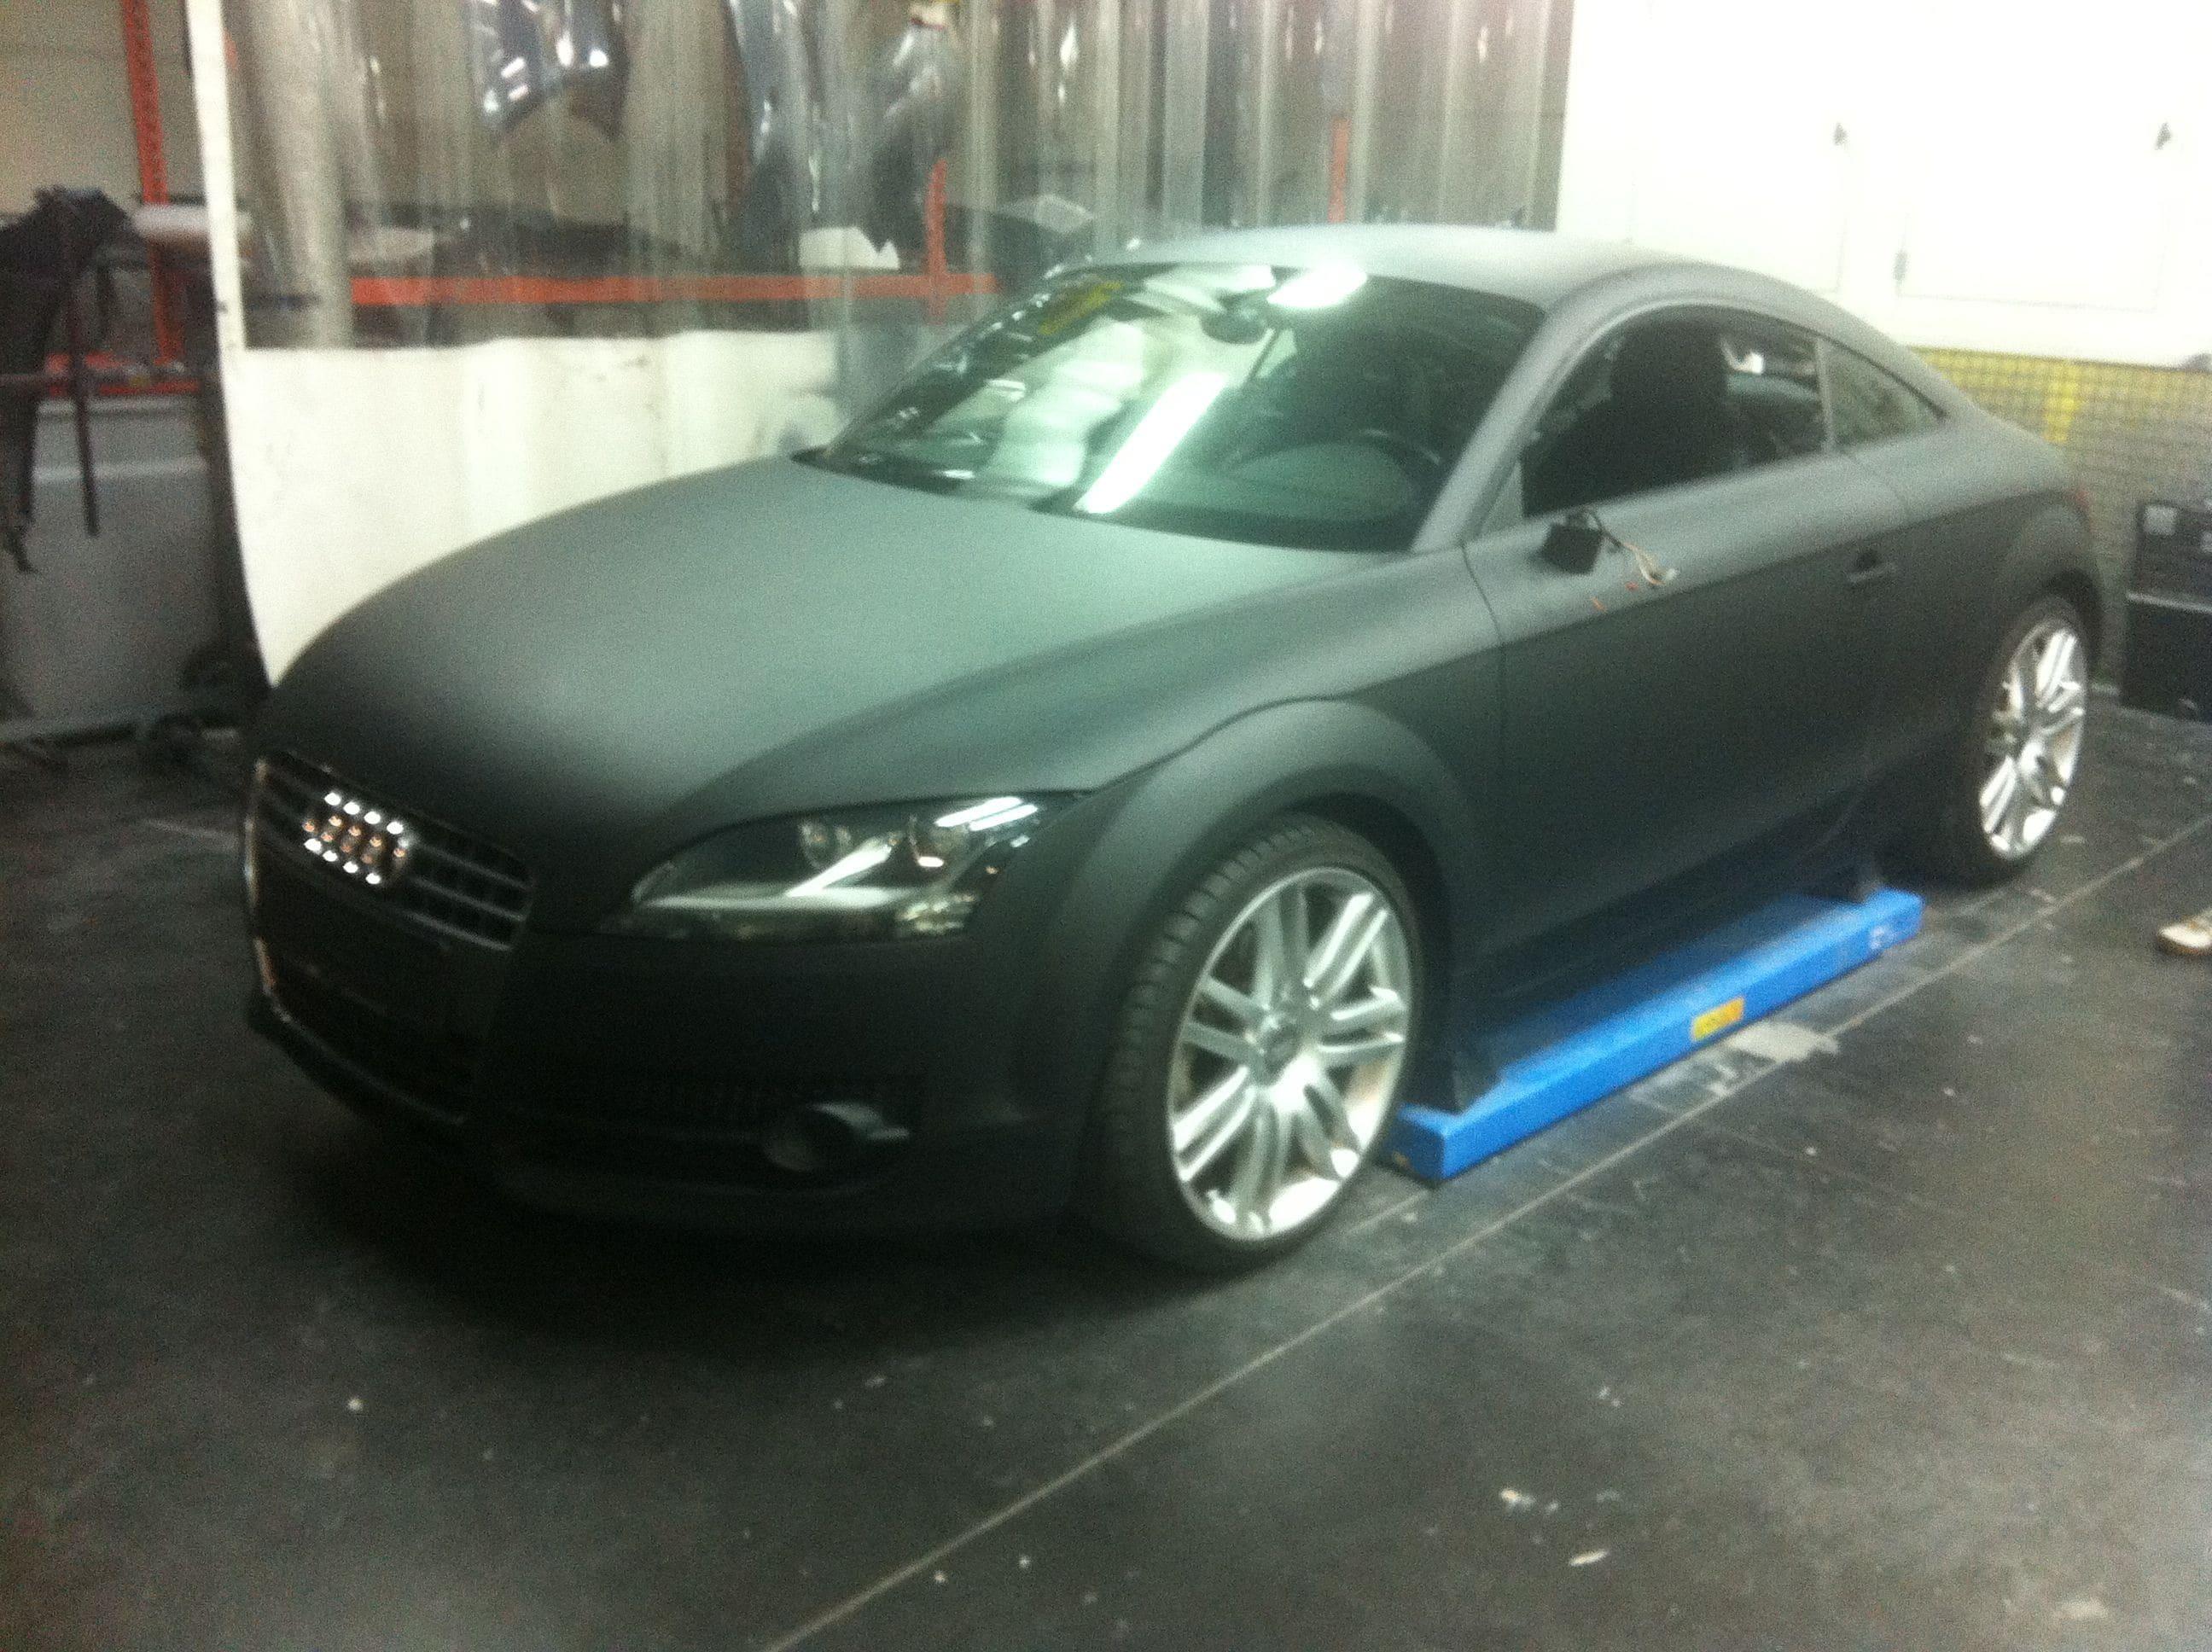 Audi TT met Mat Zwarte Wrap, Carwrapping door Wrapmyride.nu Foto-nr:5110, ©2021